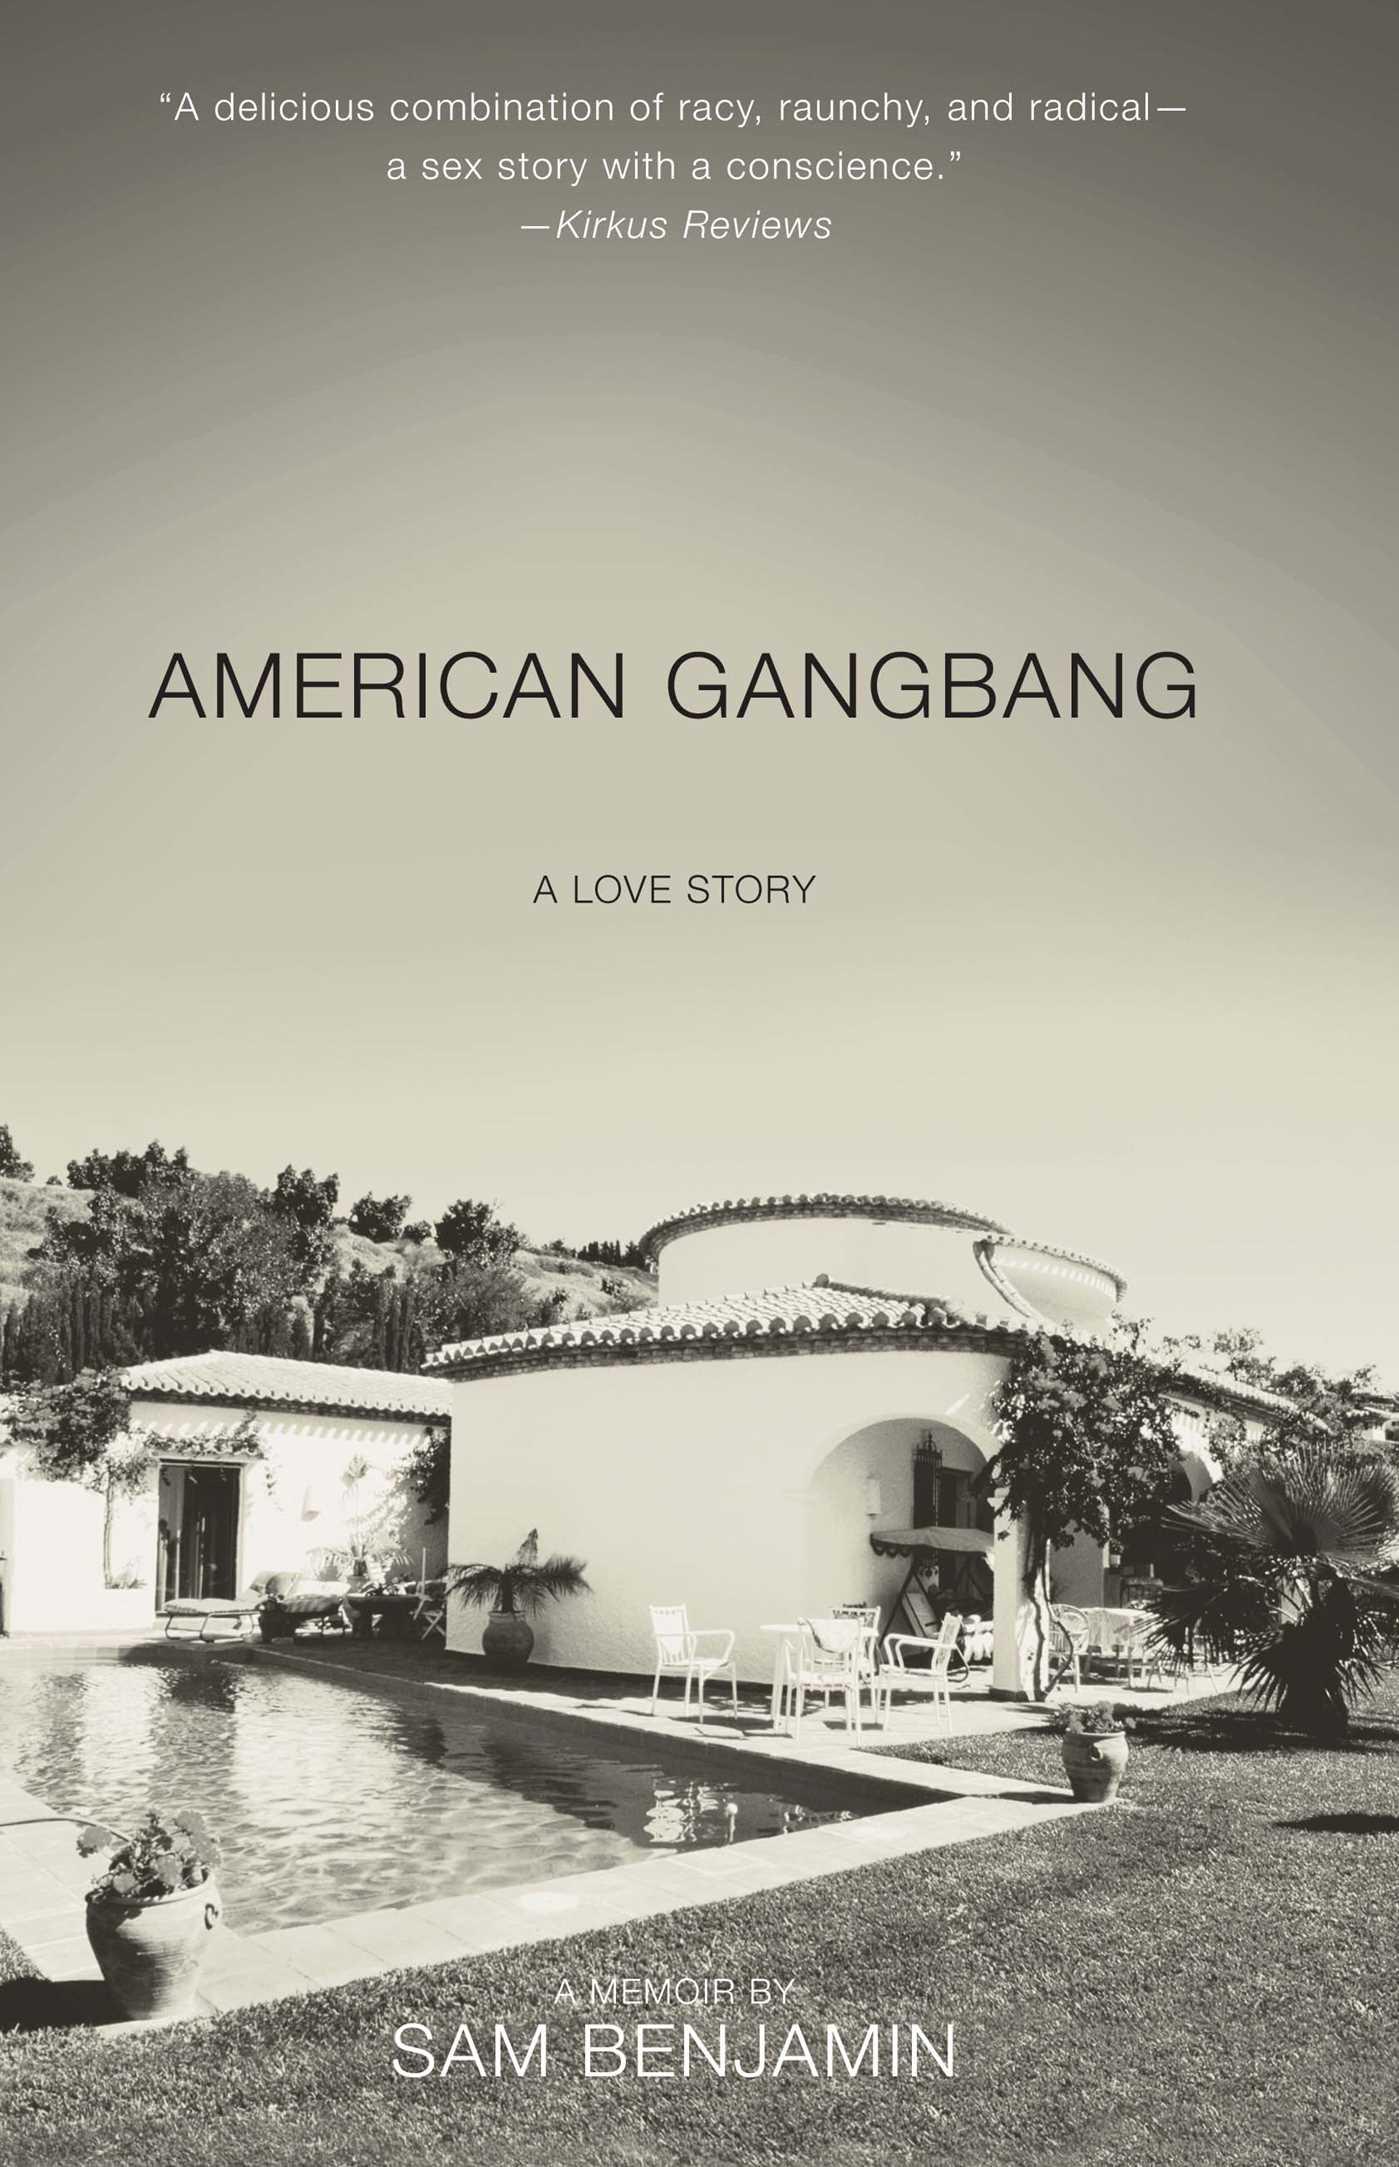 American gangbang 9781451627794 hr